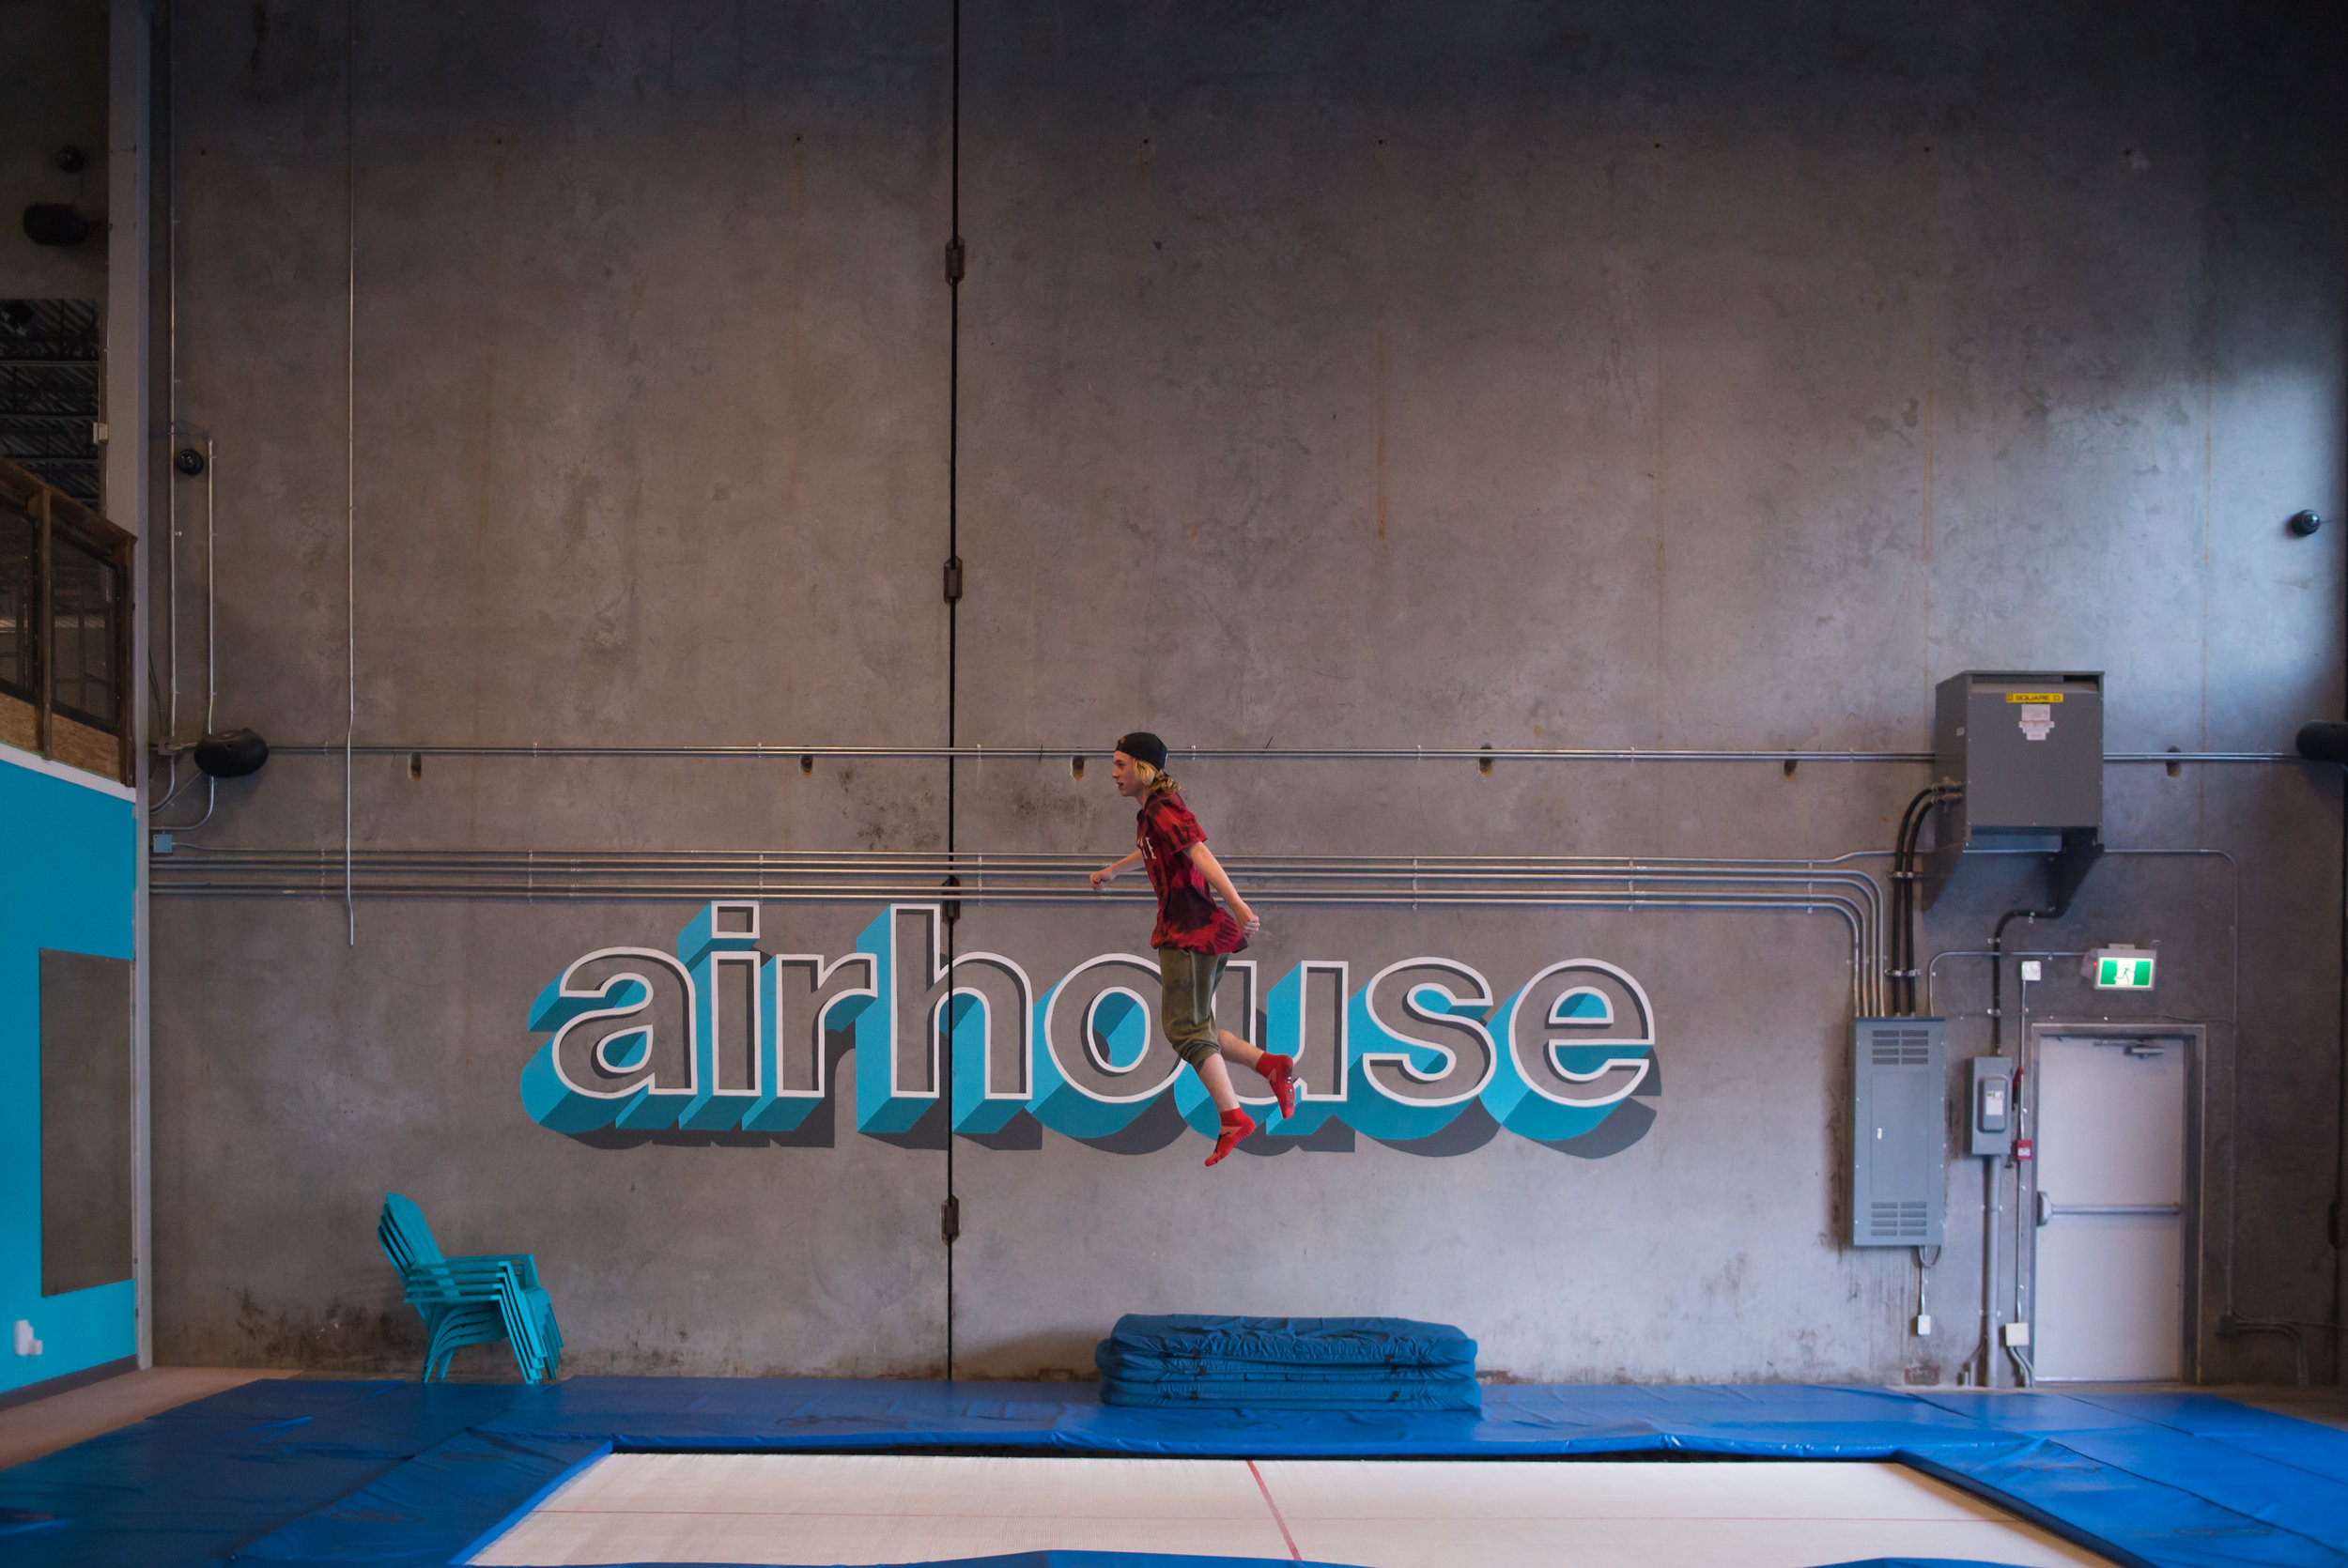 AIRHOUSE_DigitalAnthill_18.05.23-88.jpg